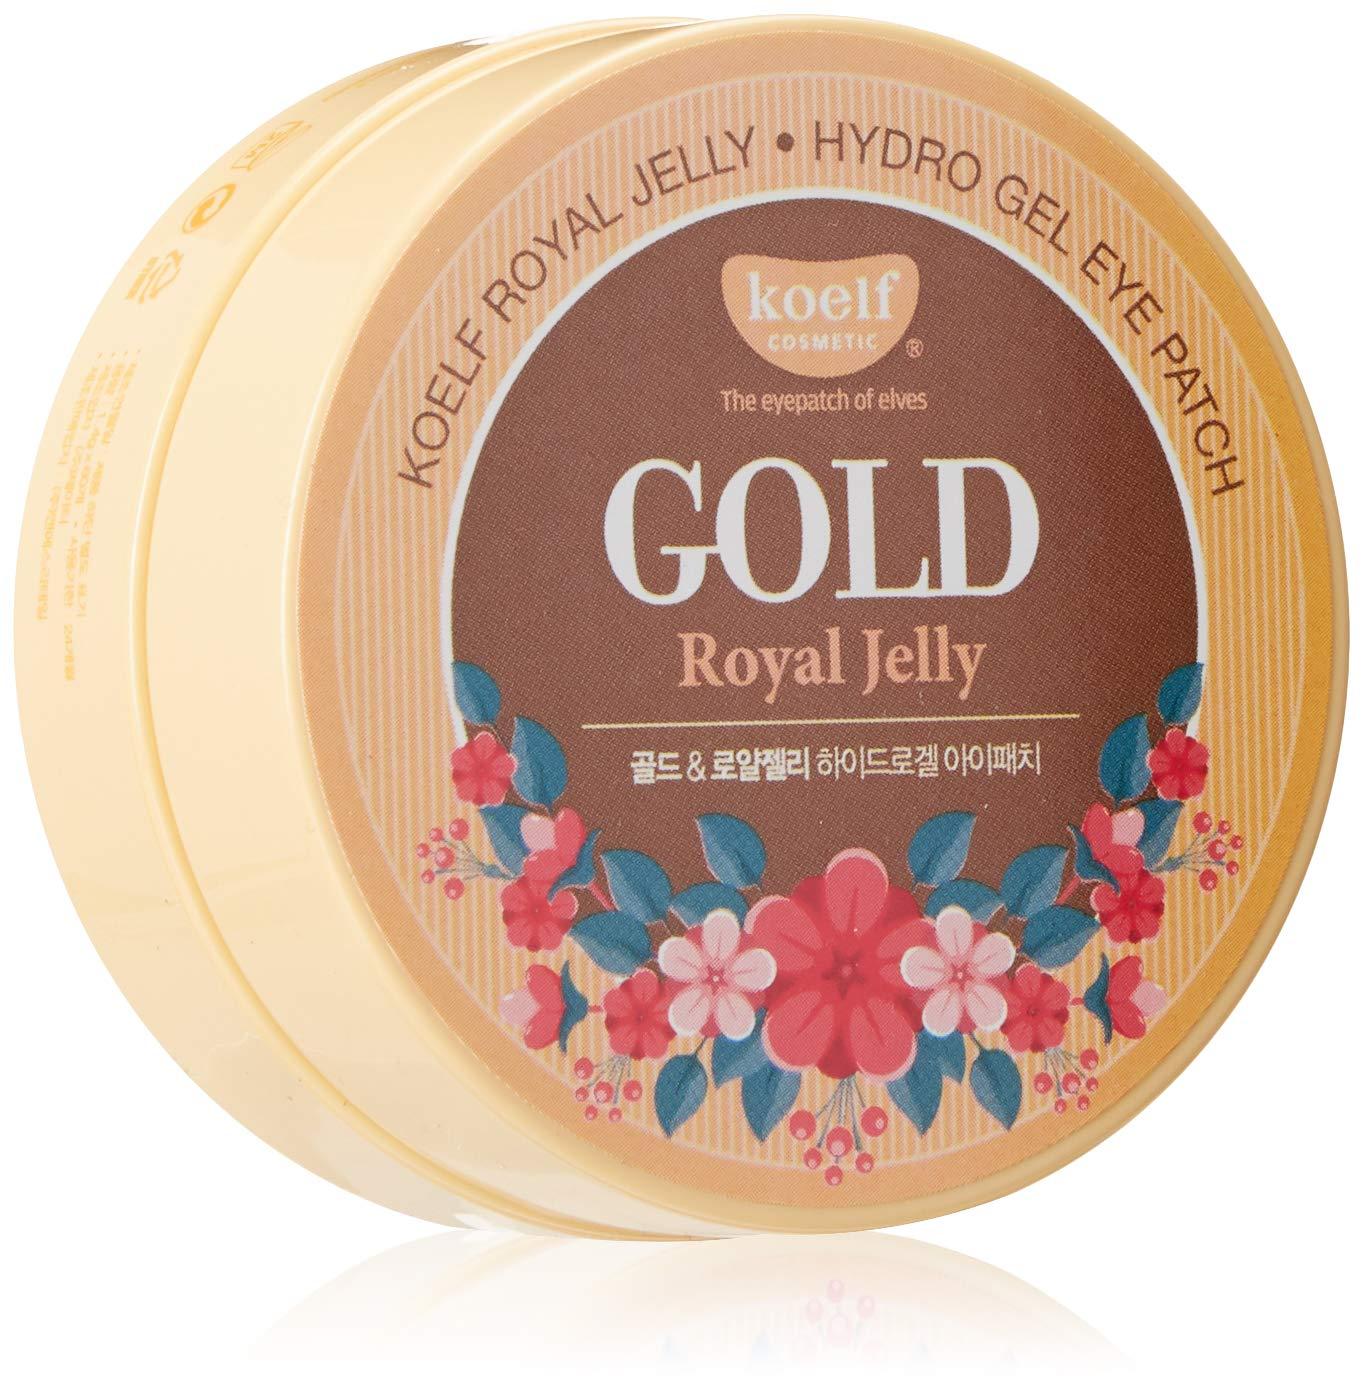 Gold Royal Jelly Hydro Gel Eye Patch - 60pcs/30pairs Koelf